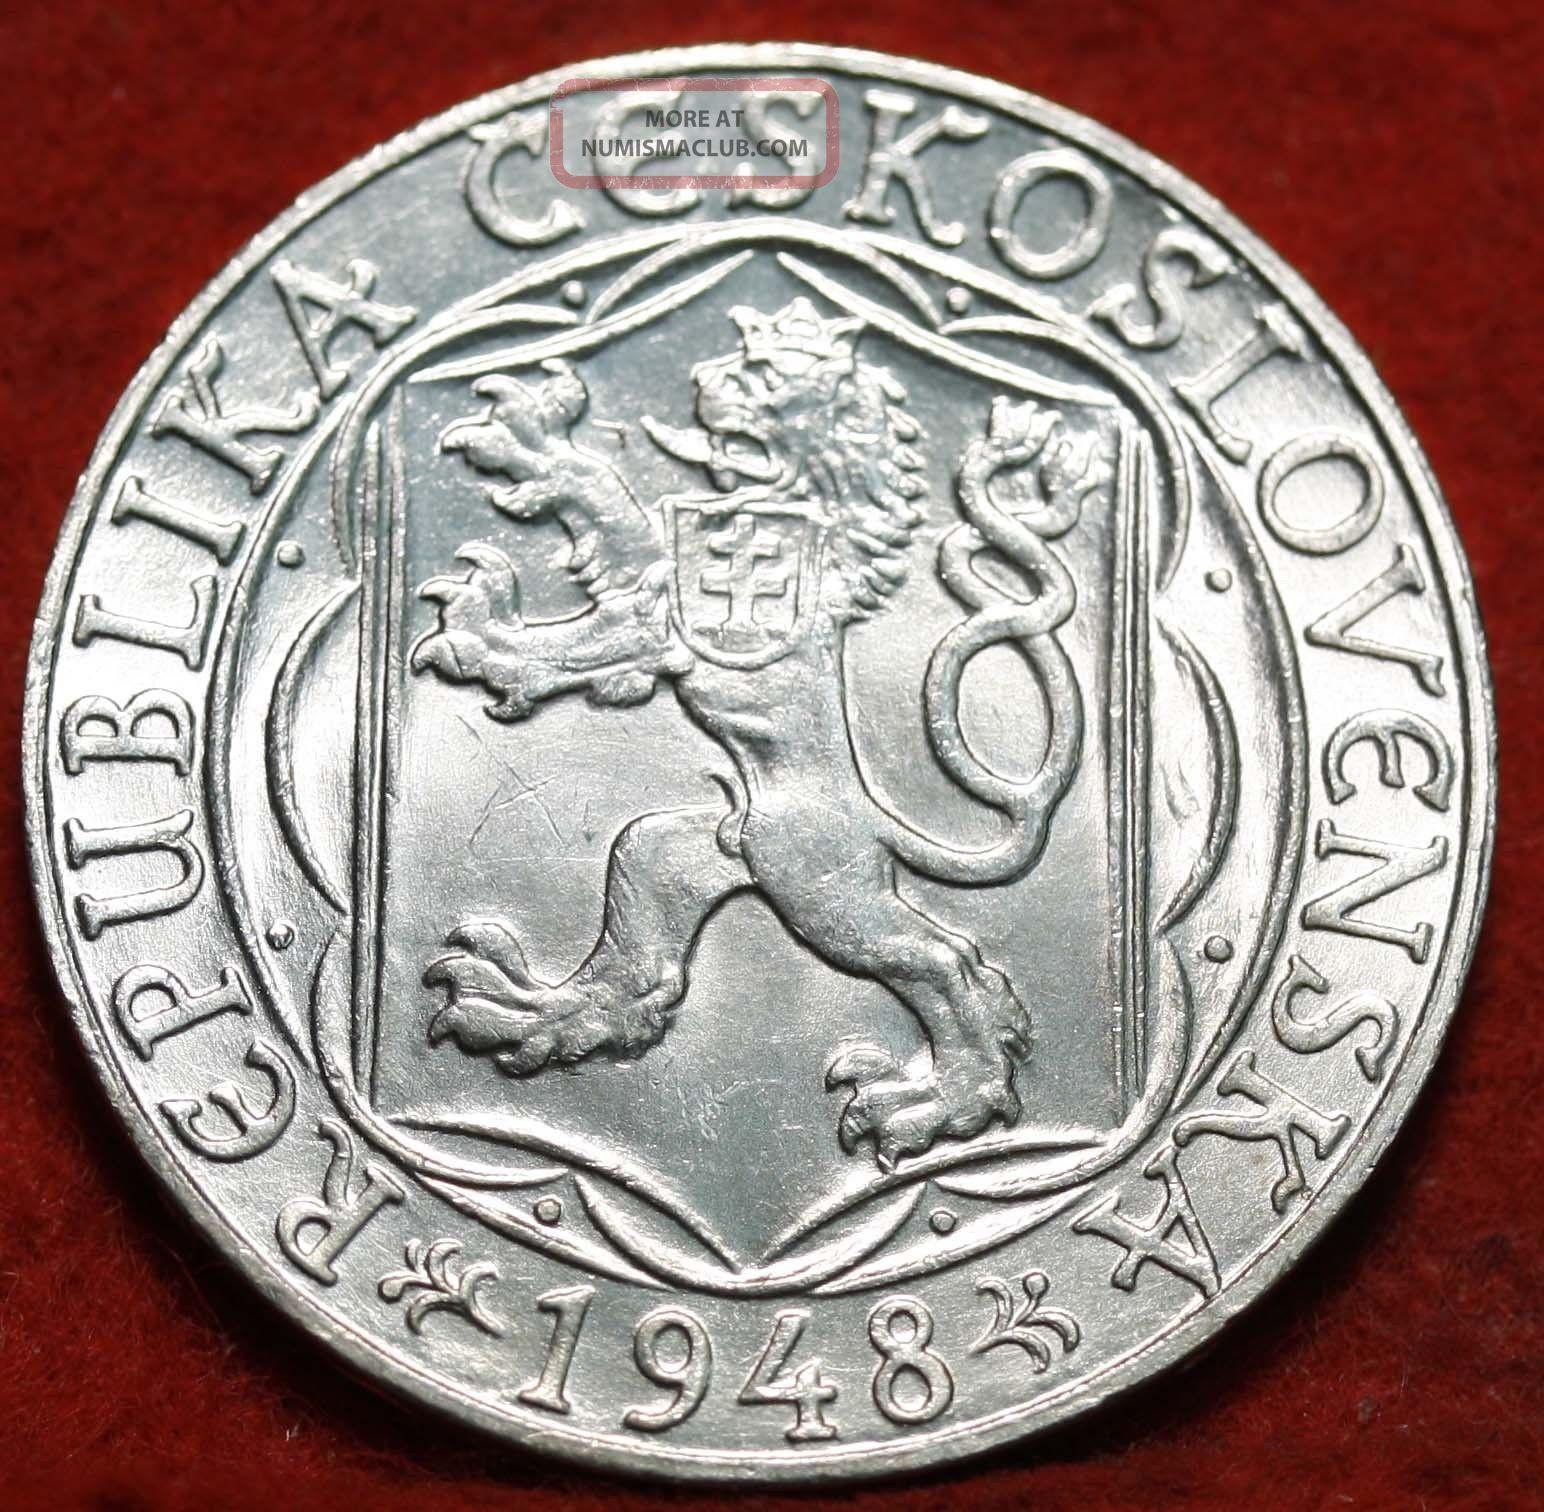 Uncirculated 1948 Czechoslovakia Silver 100 Koruns Foreign Coin S/h Europe photo